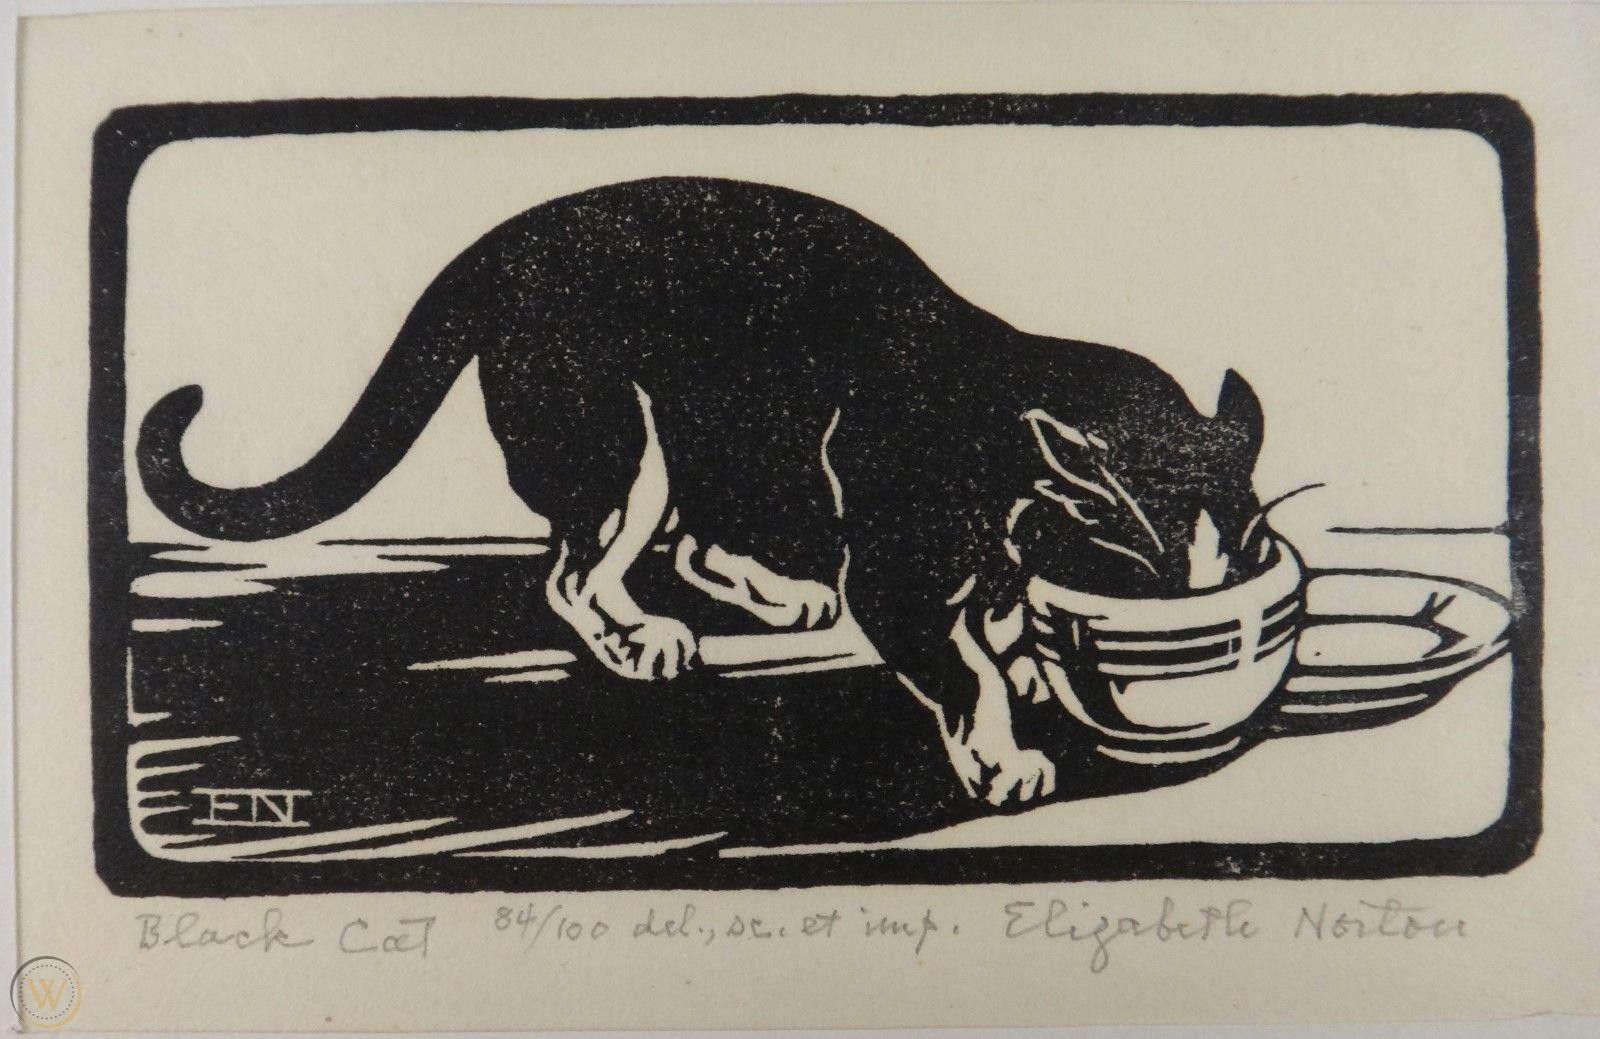 Tuxedo Cat, Elizabeth Norton